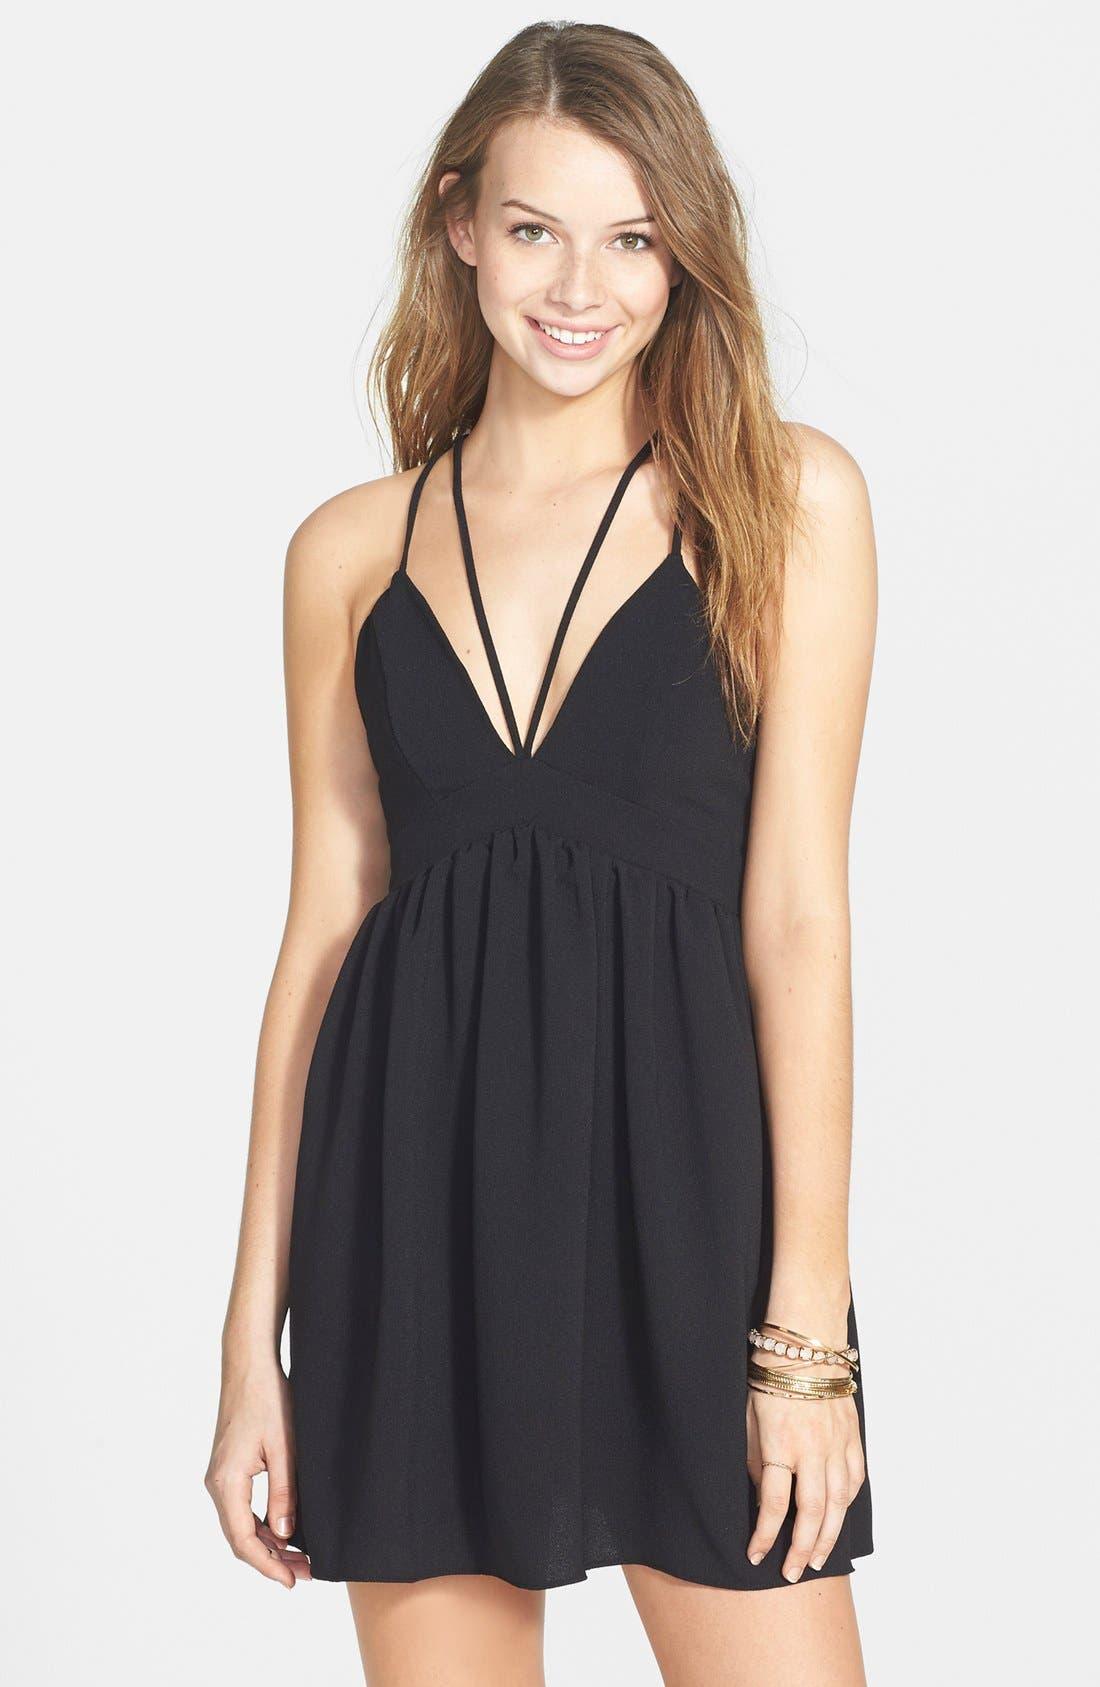 BASIL LOLA Strappy Babydoll Dress, Main, color, 001